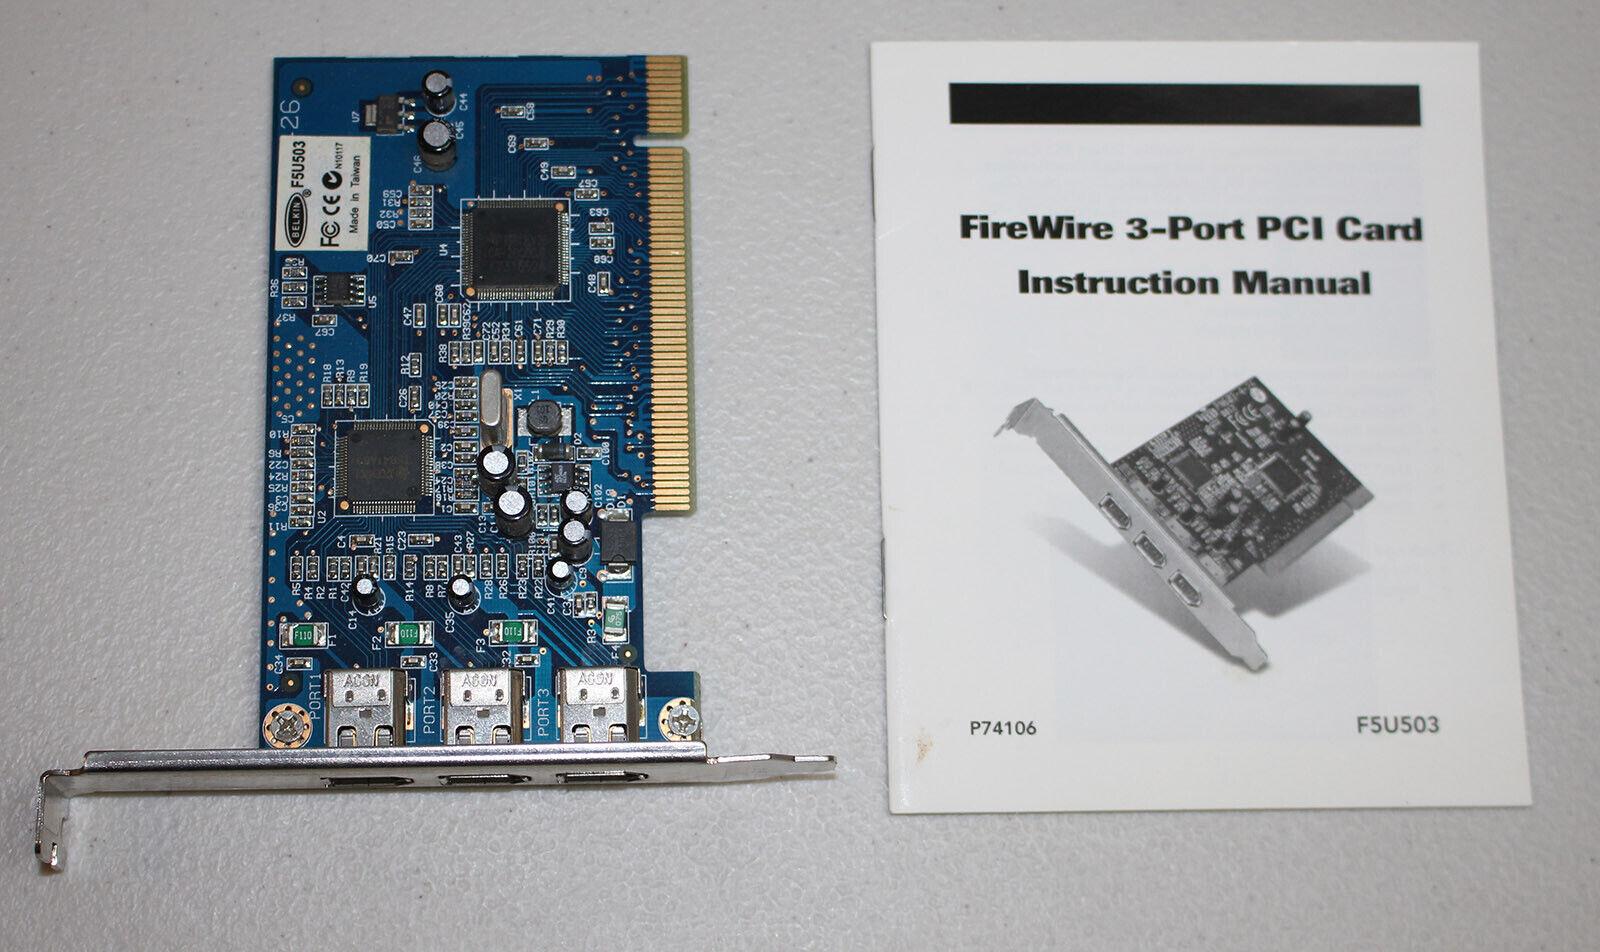 Belkin F5U503 3-Port FireWire IEEE 1394 PCI Card with Manual